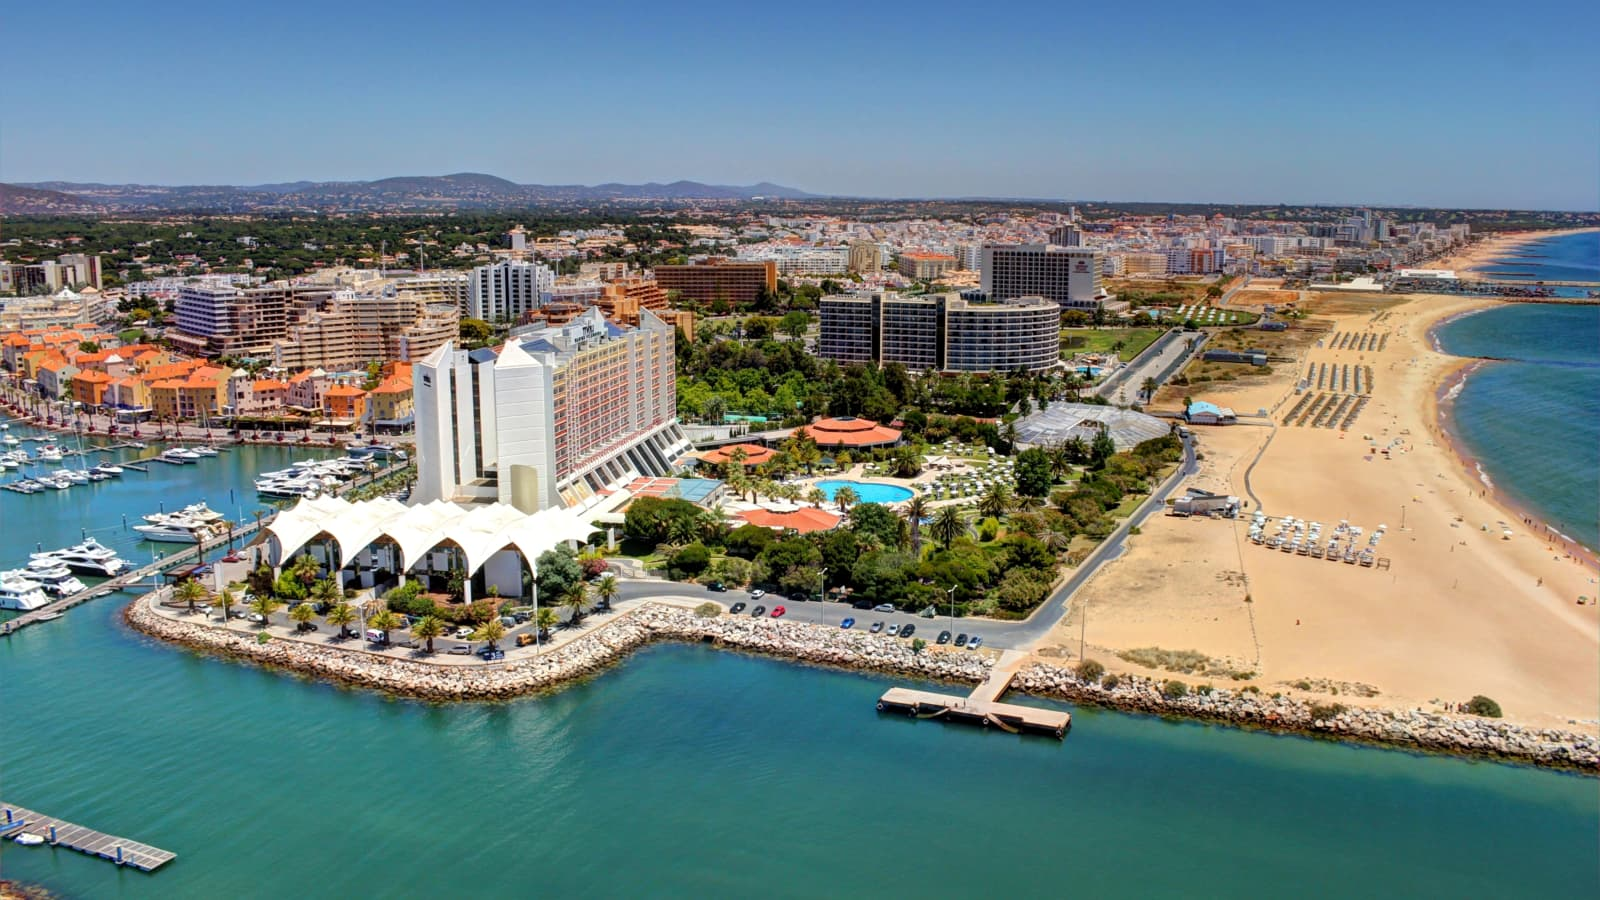 Vilamoura Holidays Algarve Holidays From Topflight Ireland S Award Winning Tour Operator